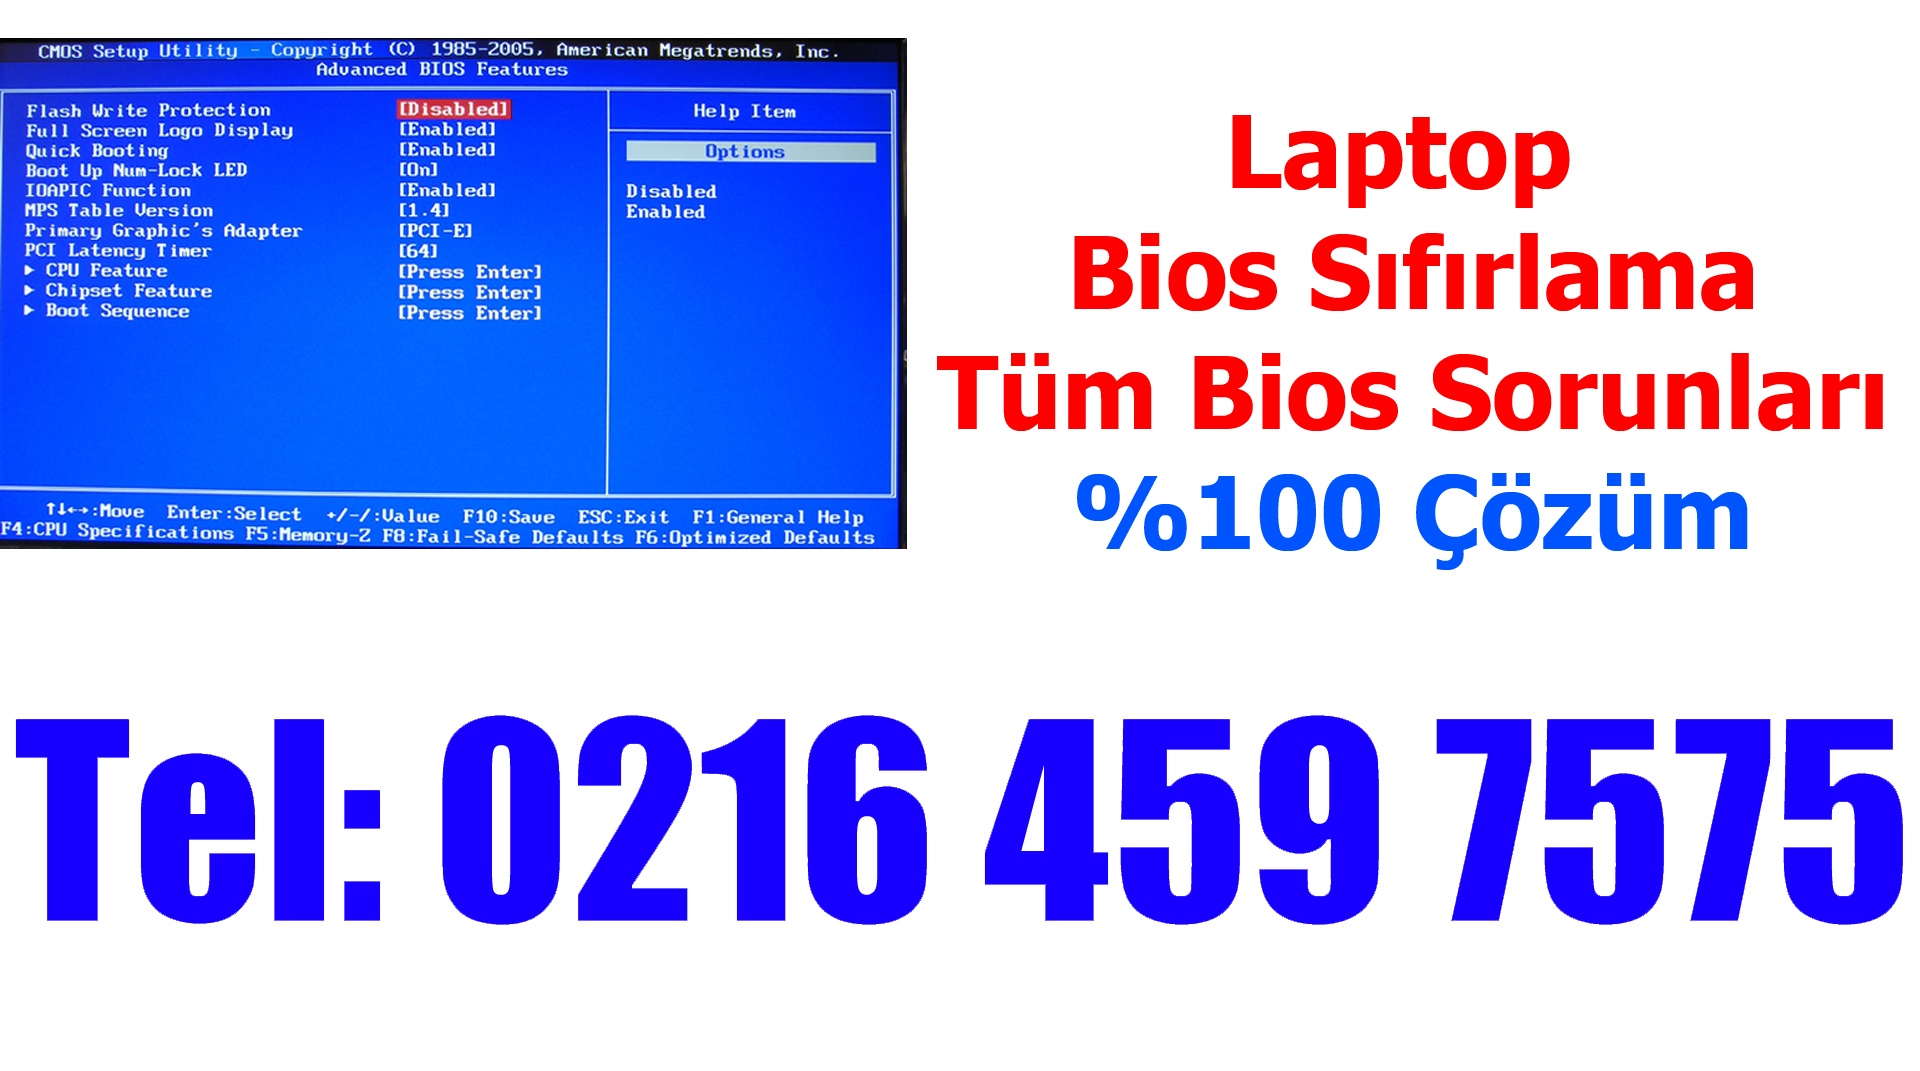 Laptop Anakart Bios Sıfırlama